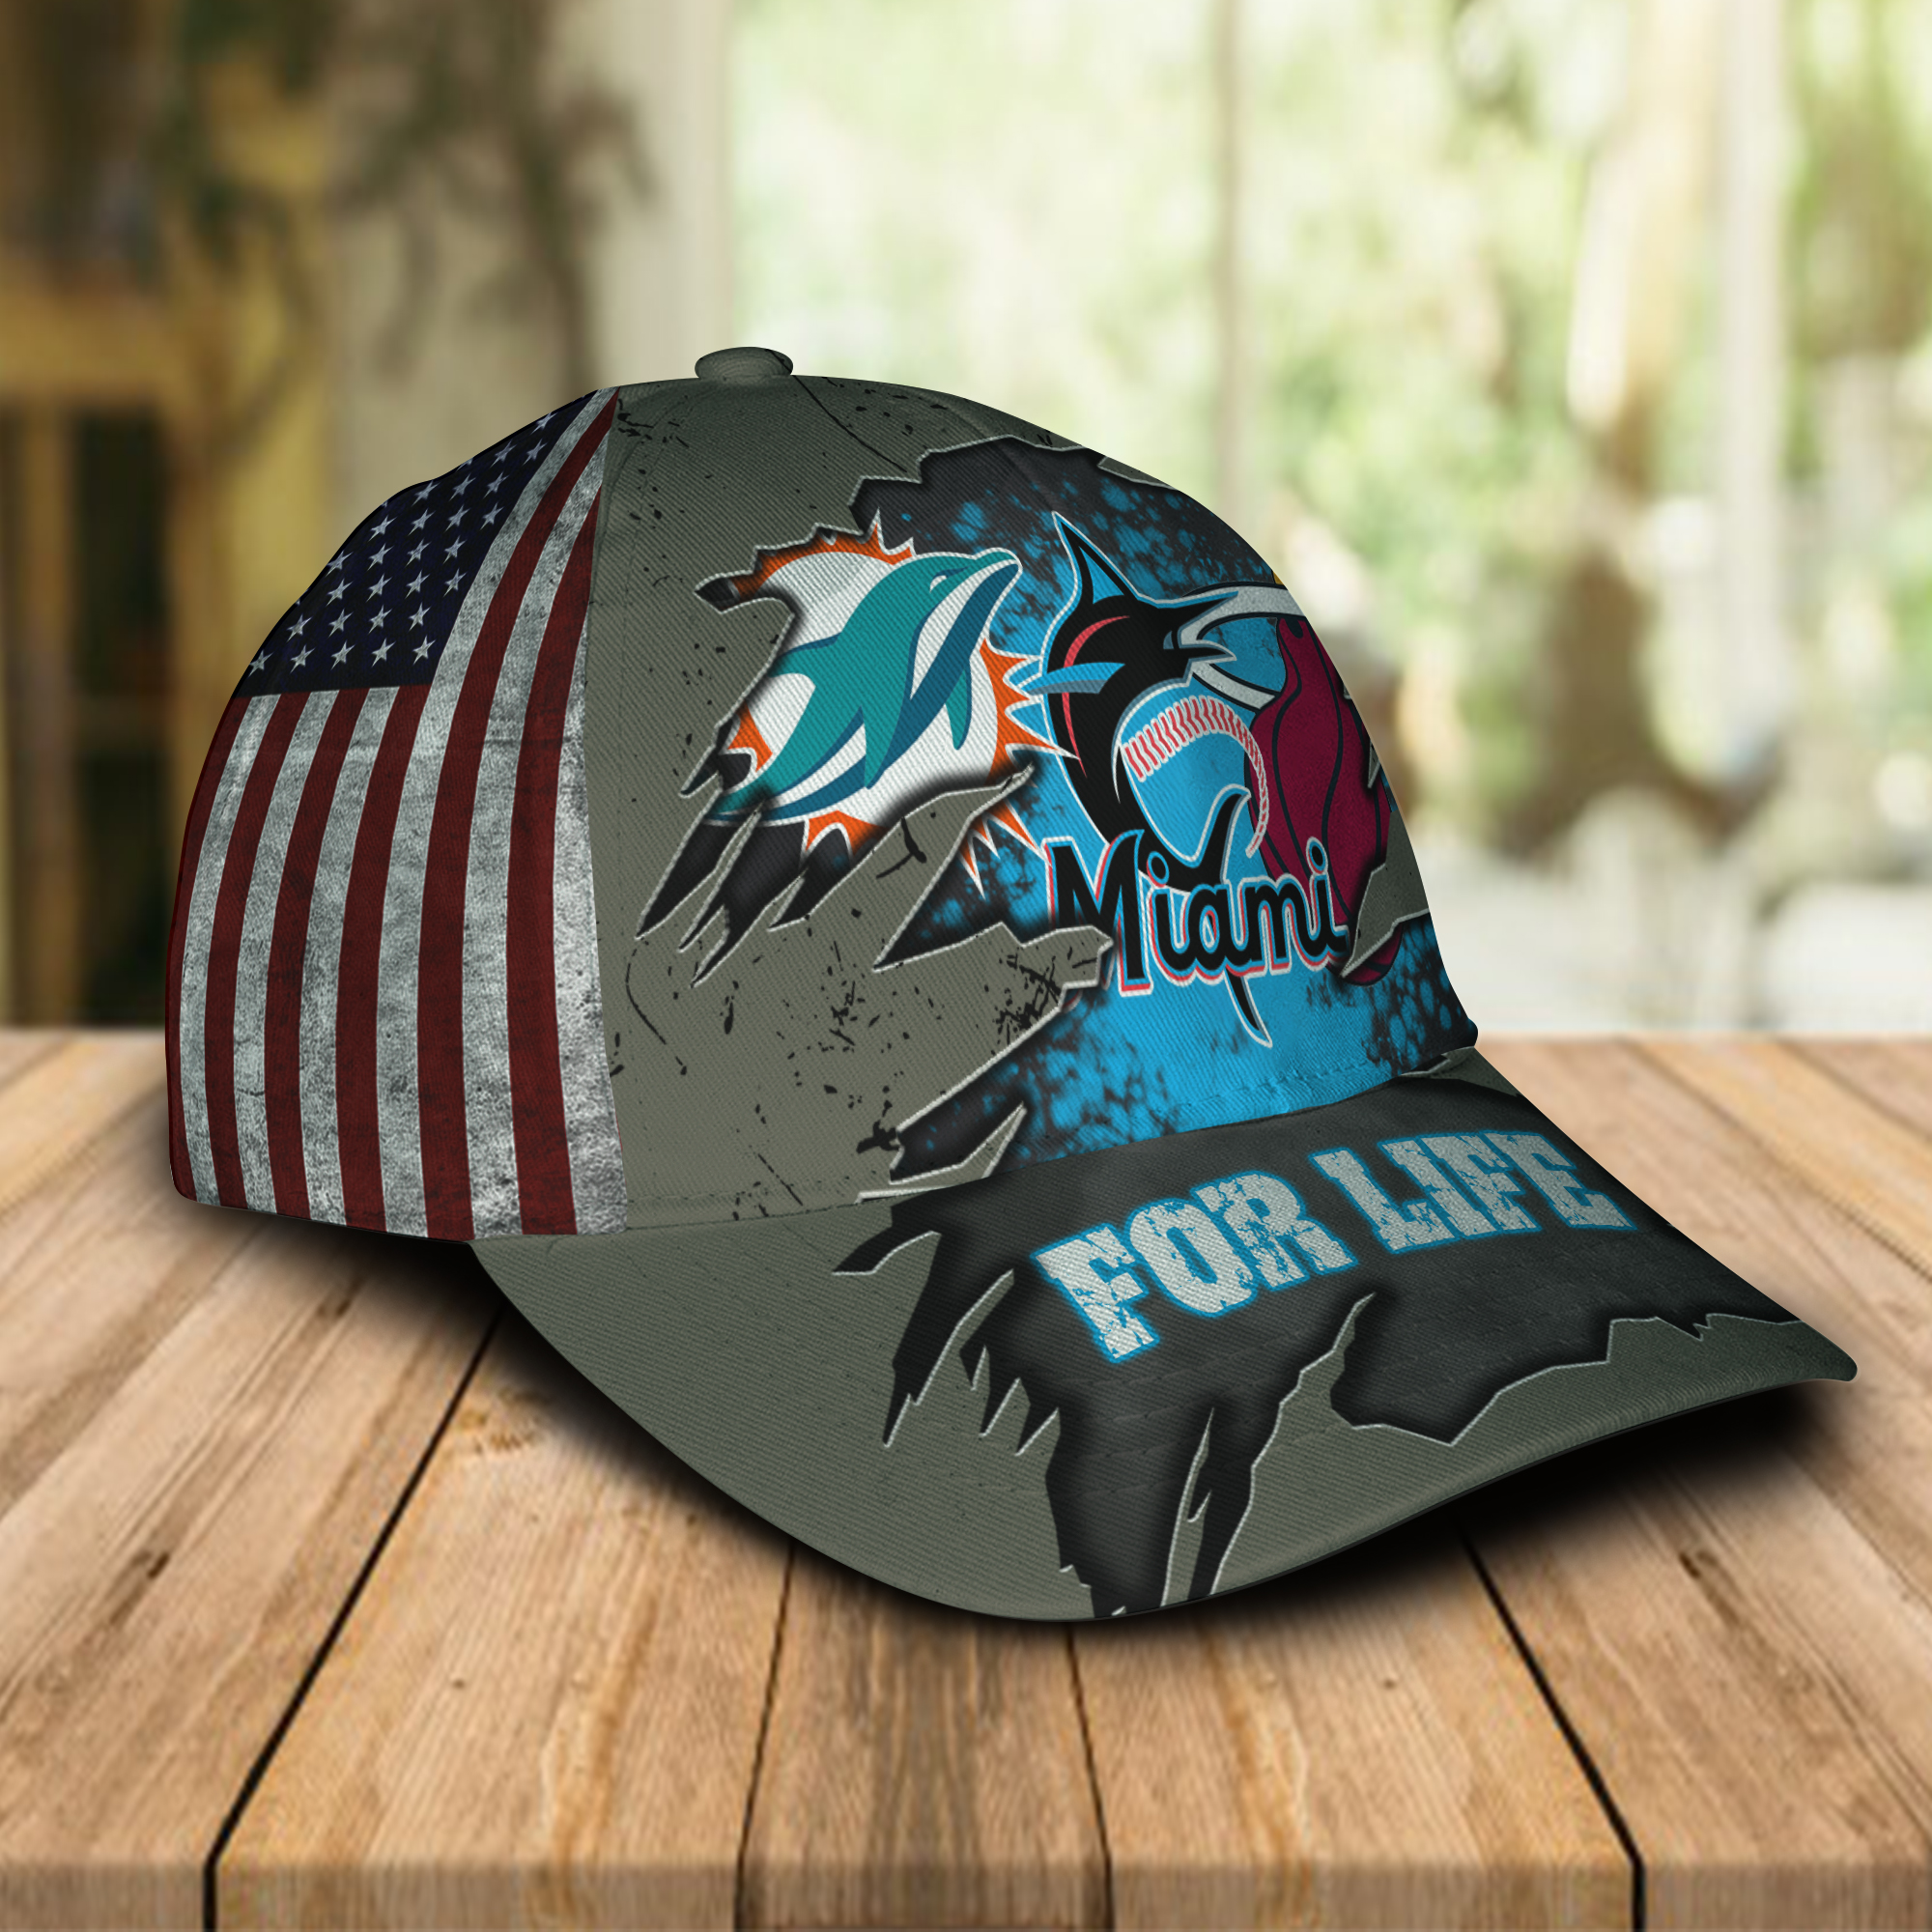 Miami Dolphins, Miami Marlins, Miami Heat For Life Hat Cap -1